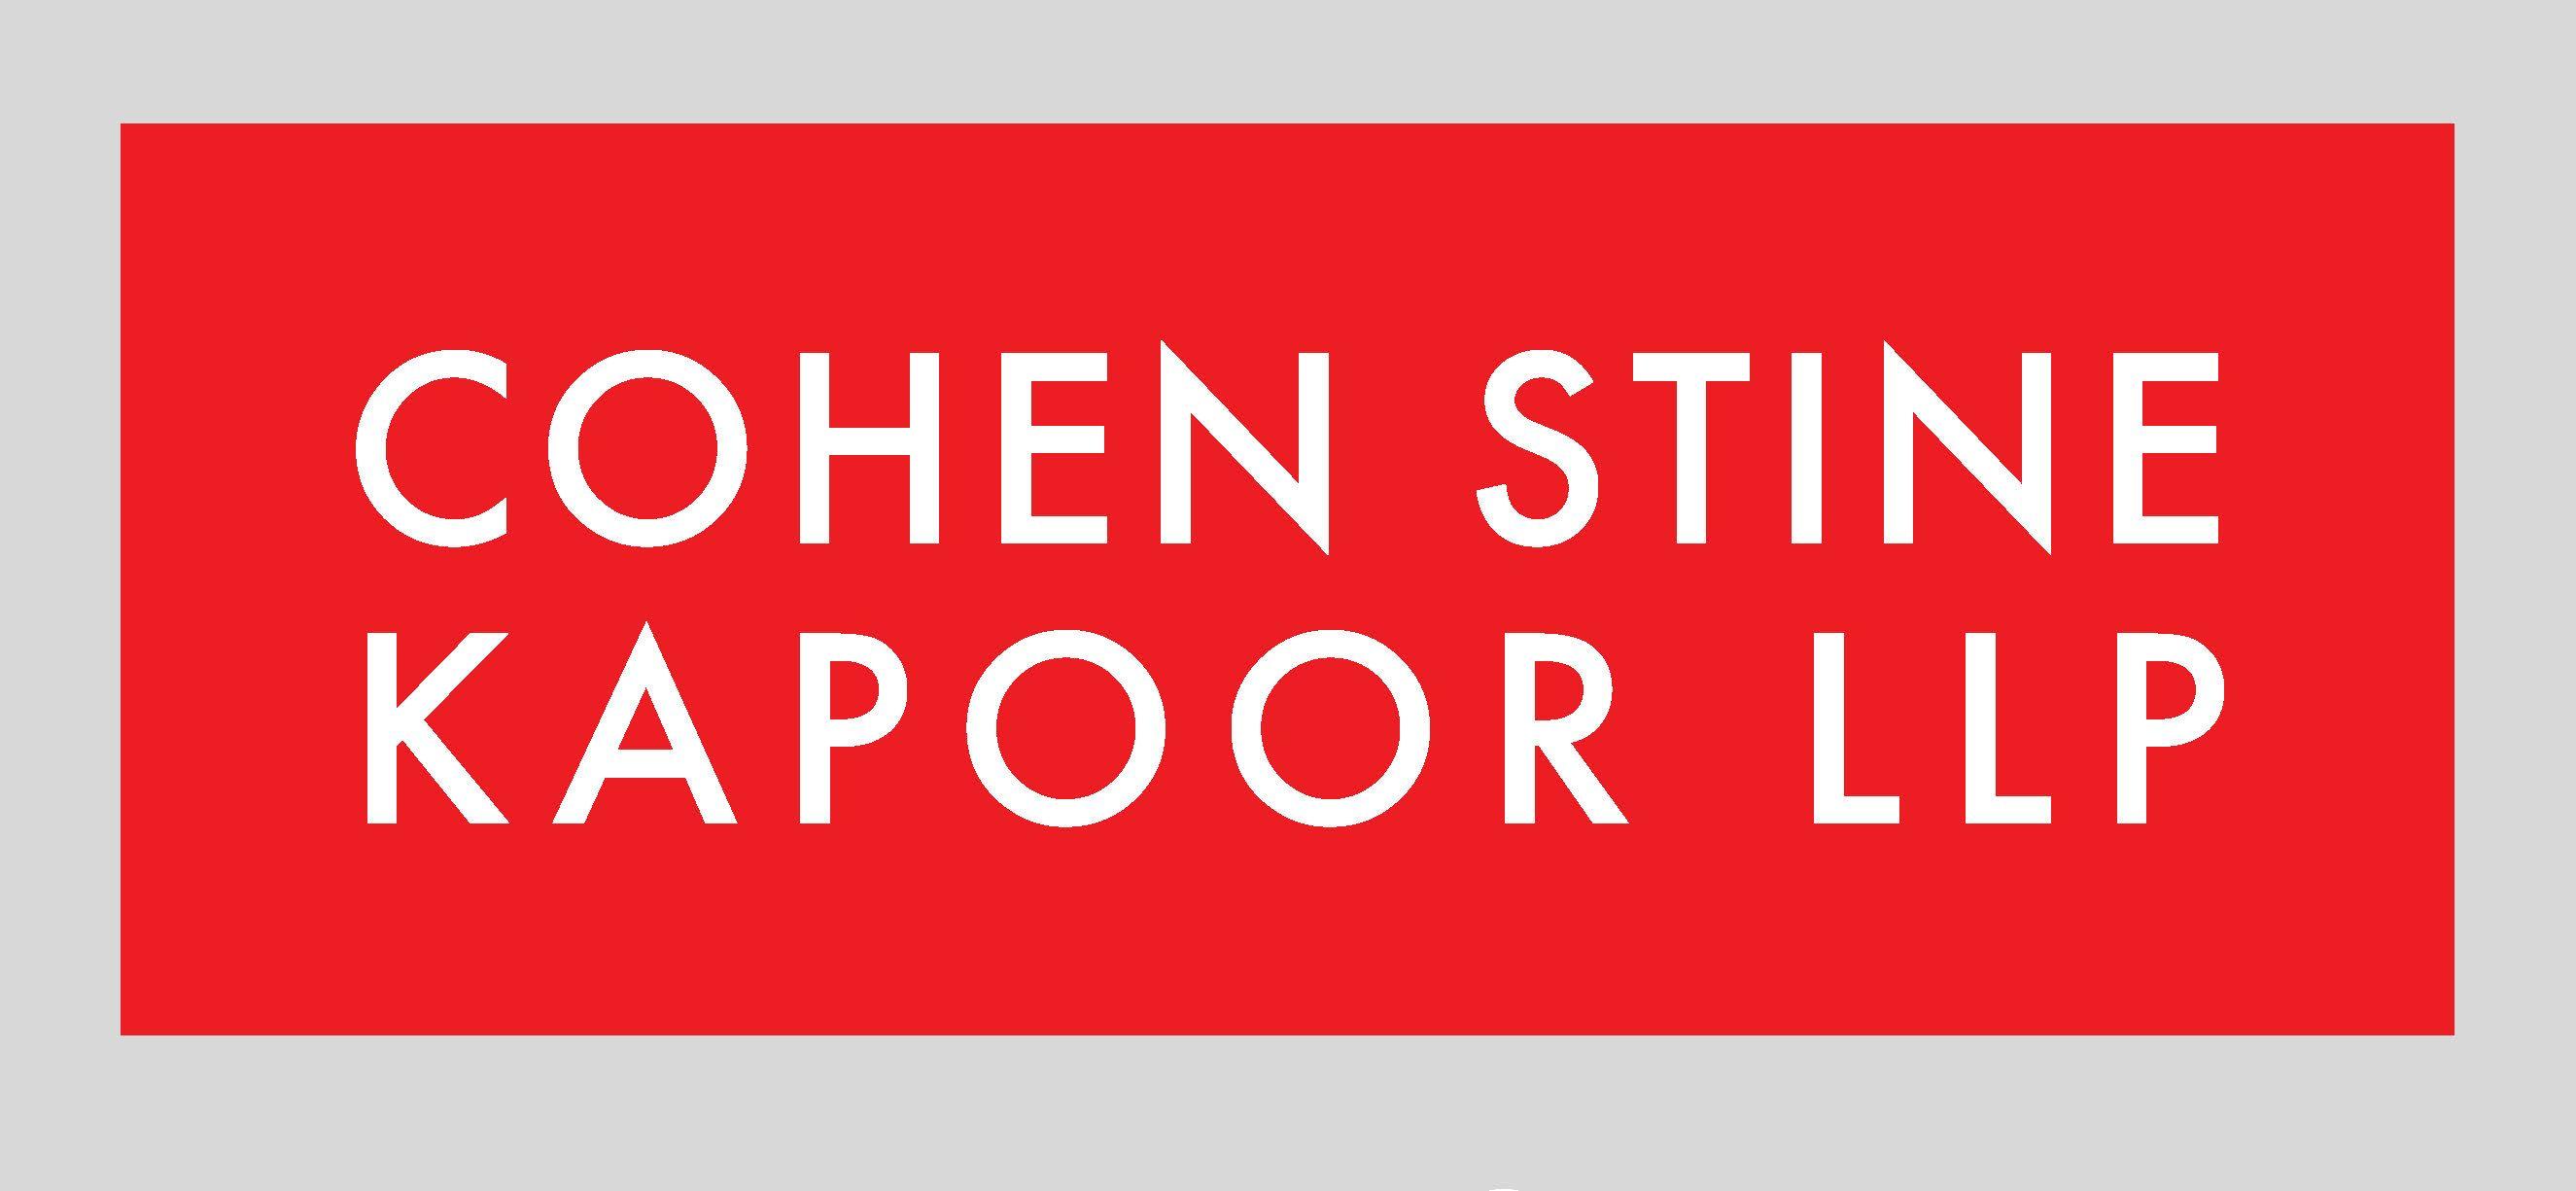 Cohen Stine Kapoor LLP law firm logo